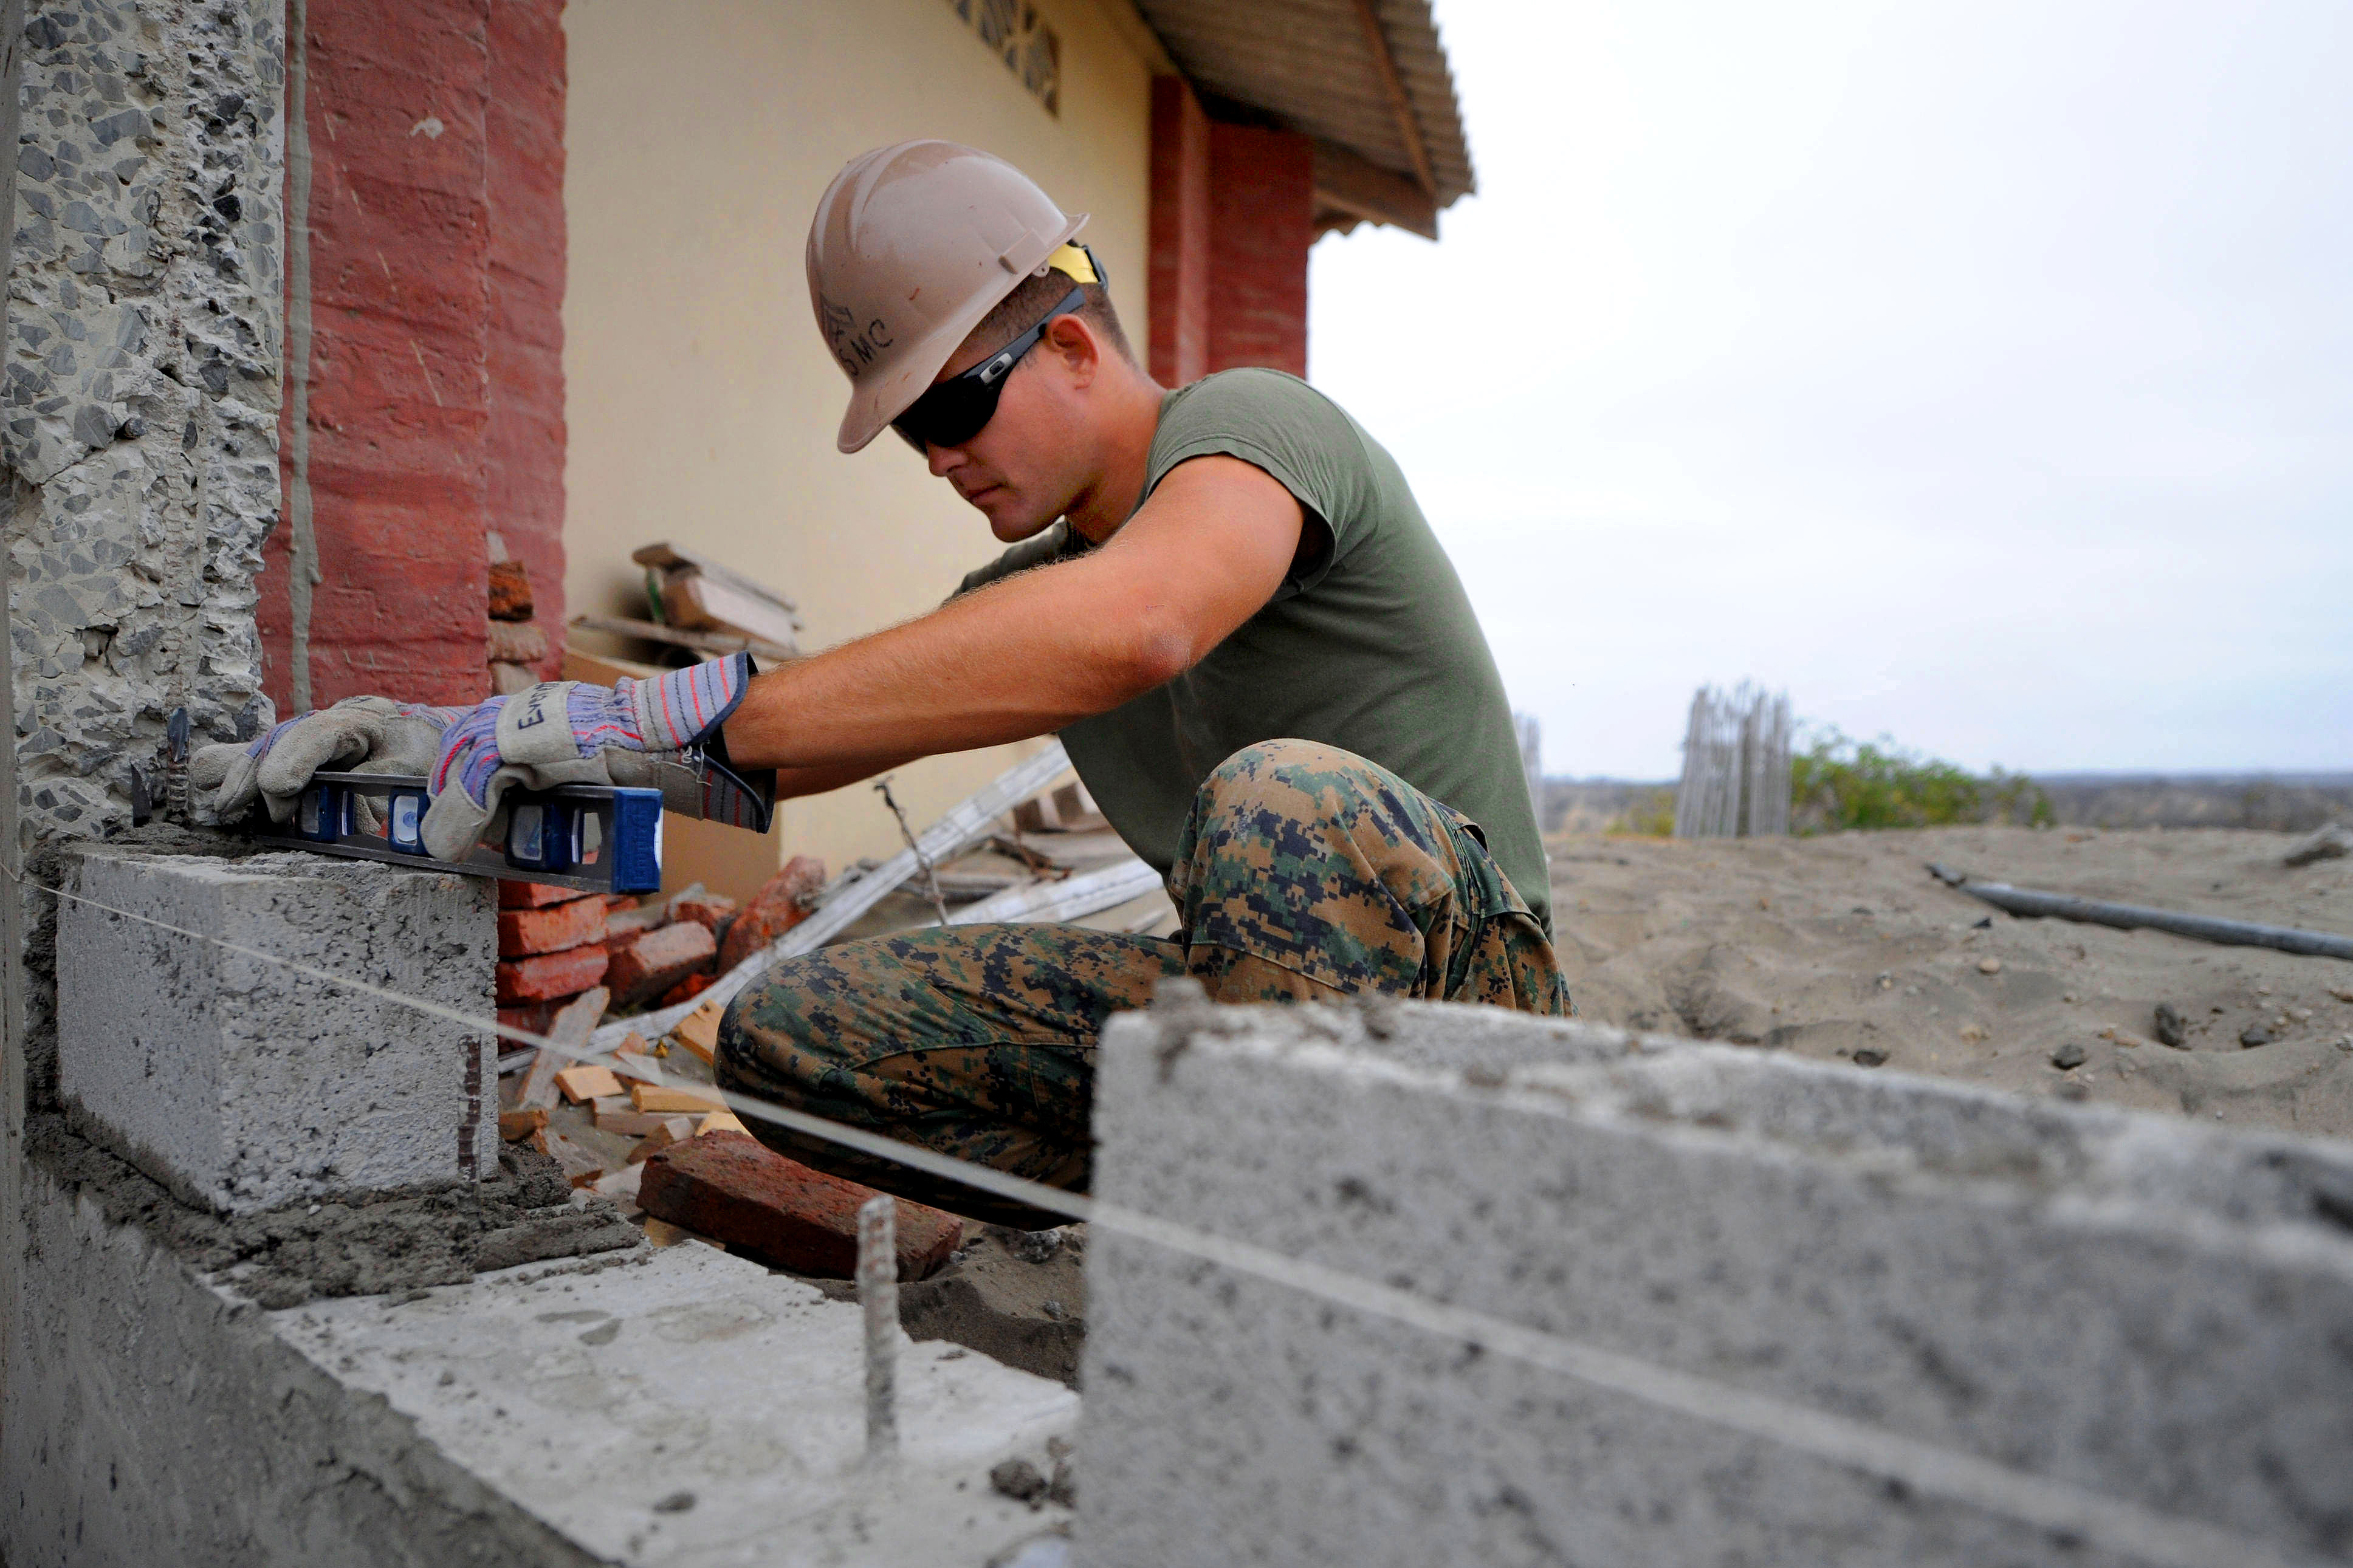 File:Defense.gov News Photo 110517-F-ET173-147 - U.S ...